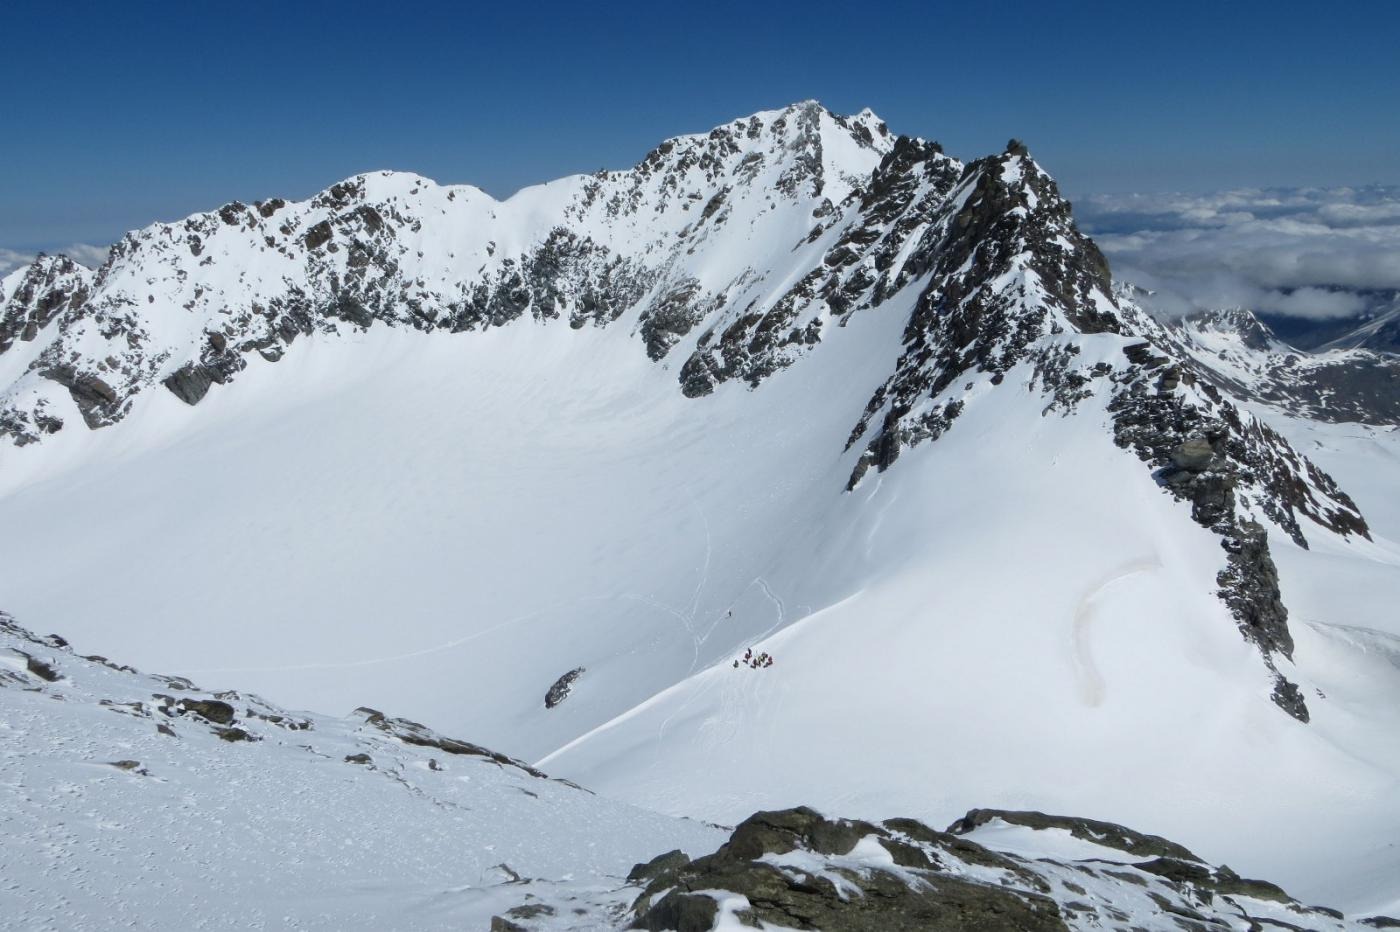 Gebroulaz (Mont du) da Val Thorens per il Col du Gebroulaz 2015-05-27